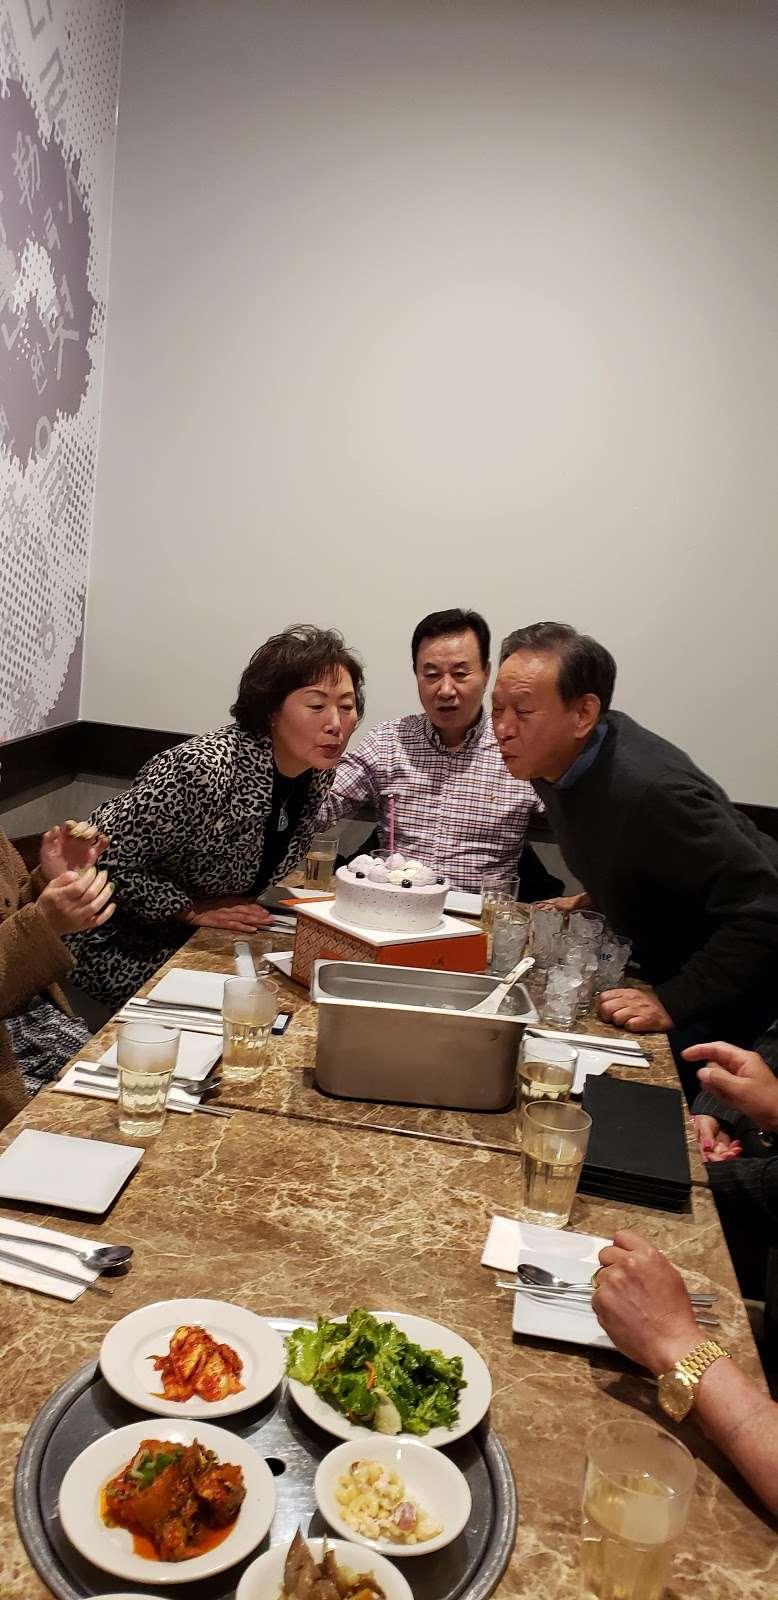 Dol Seafood Korean Restaurant (뉴저지 돌식당) - restaurant  | Photo 1 of 1 | Address: 1475 Bergen Blvd #16, Fort Lee, NJ 07024, USA | Phone: (201) 969-2070